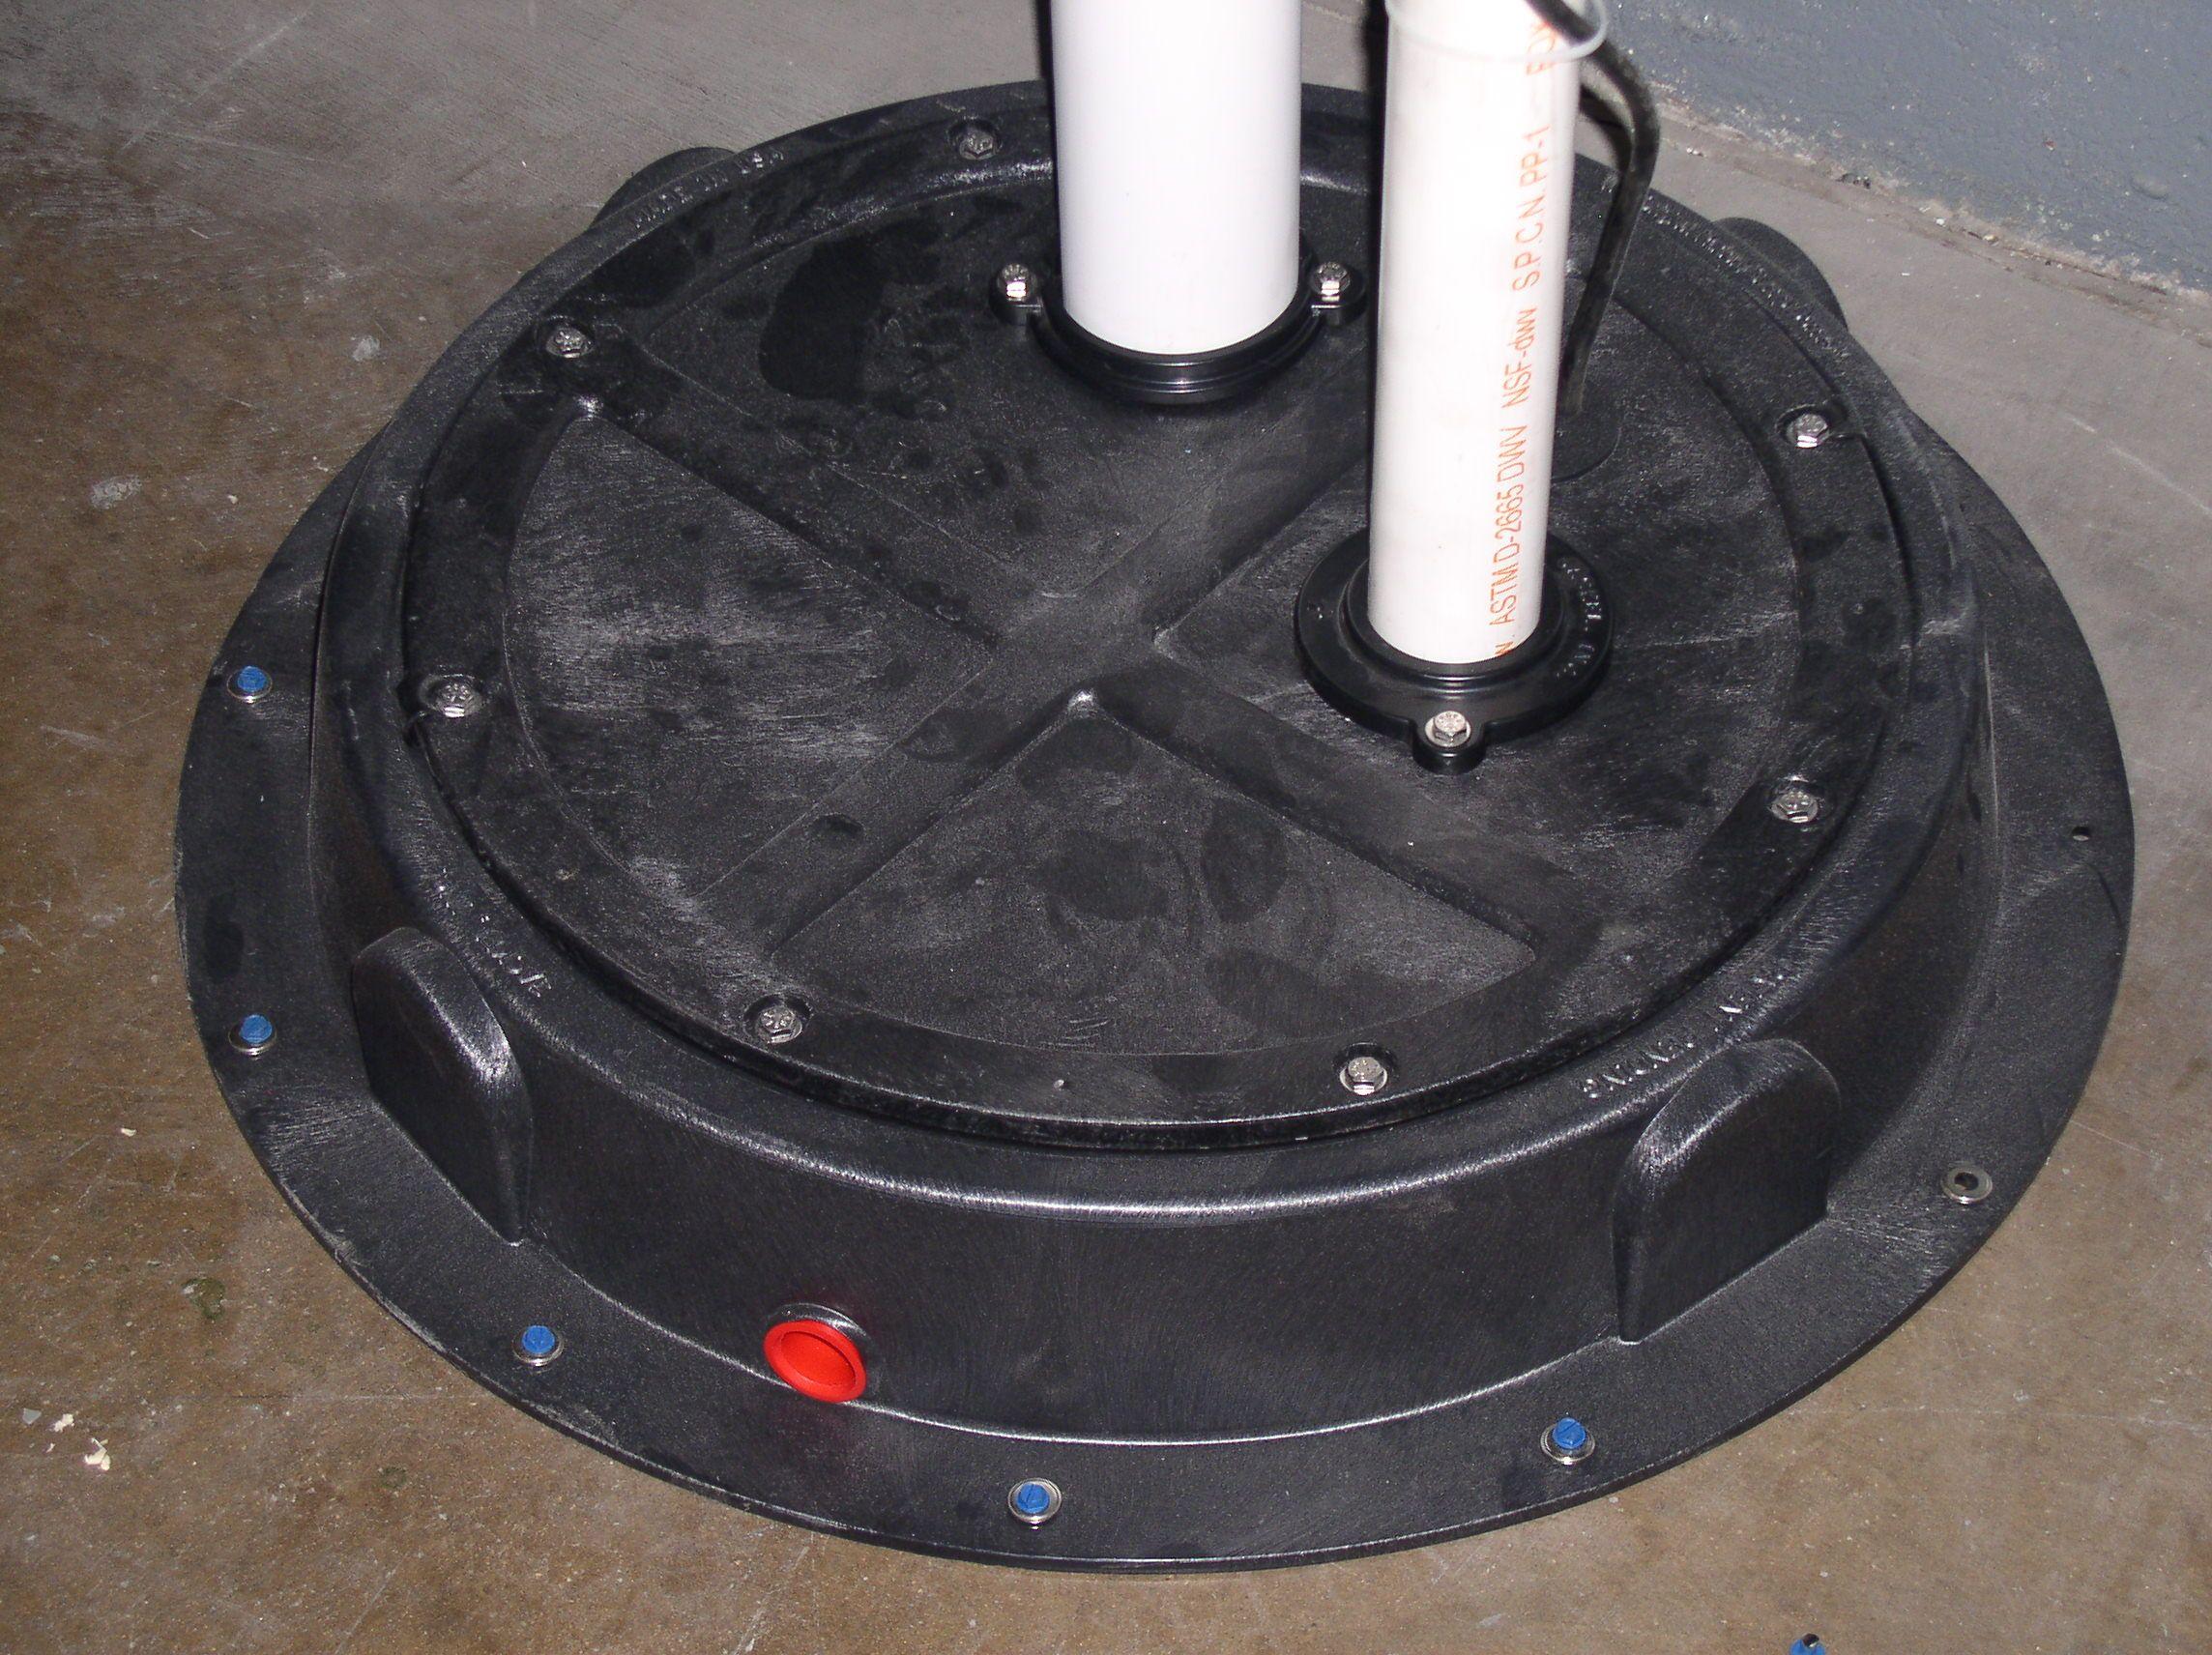 Plumbstar Usa Original Radon Sump Dome Plumbed Up Radon Mitigation Home Improvement Radon